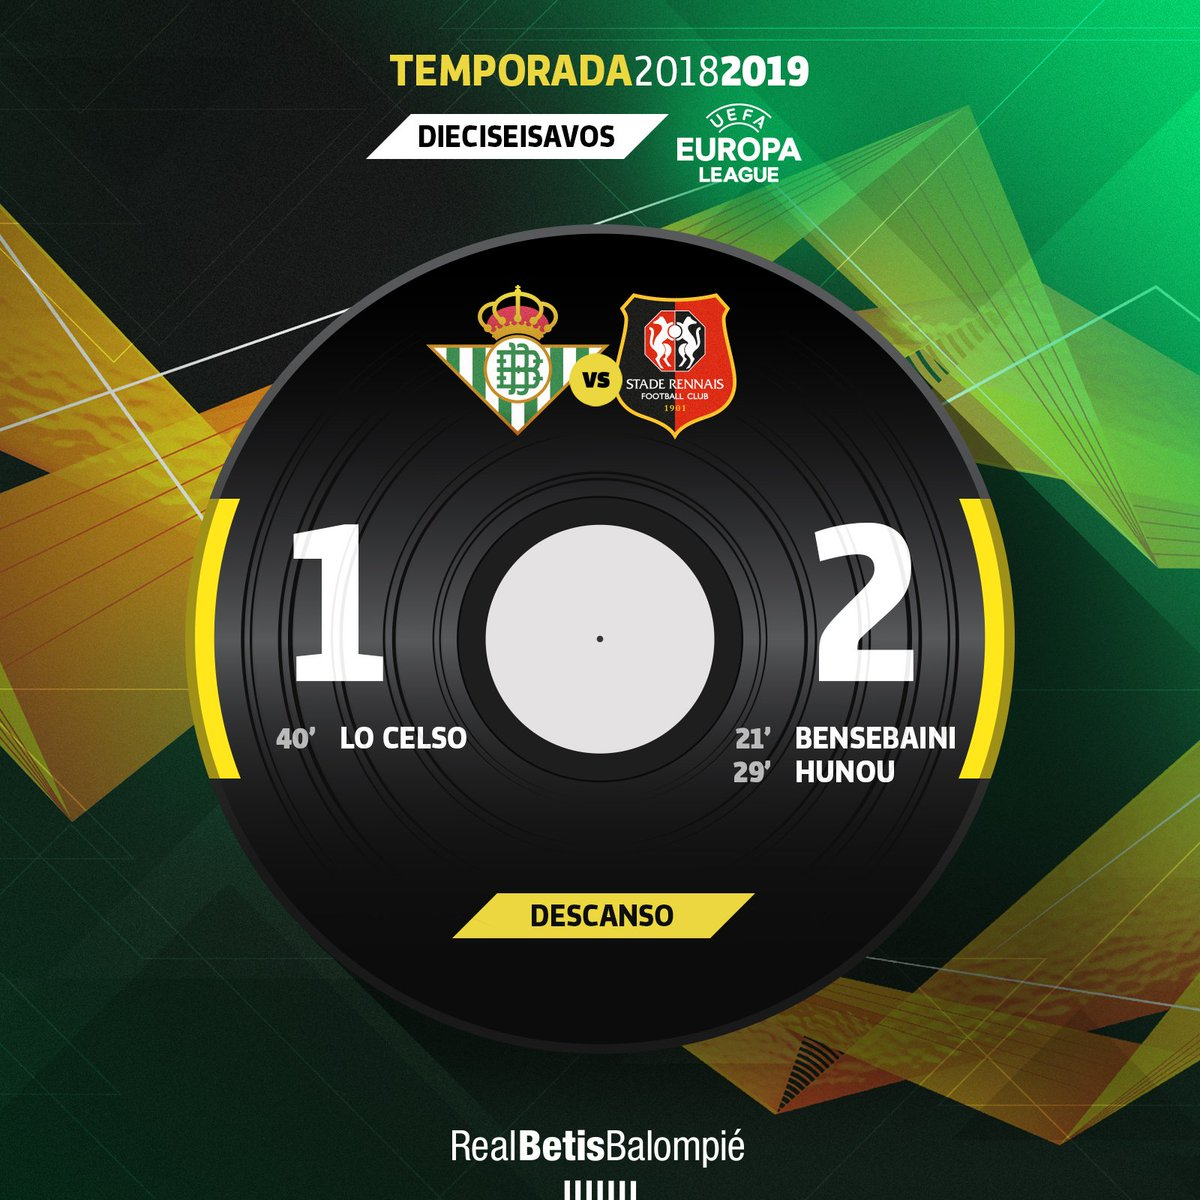 45' ⏱⚽️ Descanso en el Estadio Benito Villamarín   💚⚪️ #RealBetisSRFC 1-2 🔴⚫  #DíaDeBetis #EuroBetis